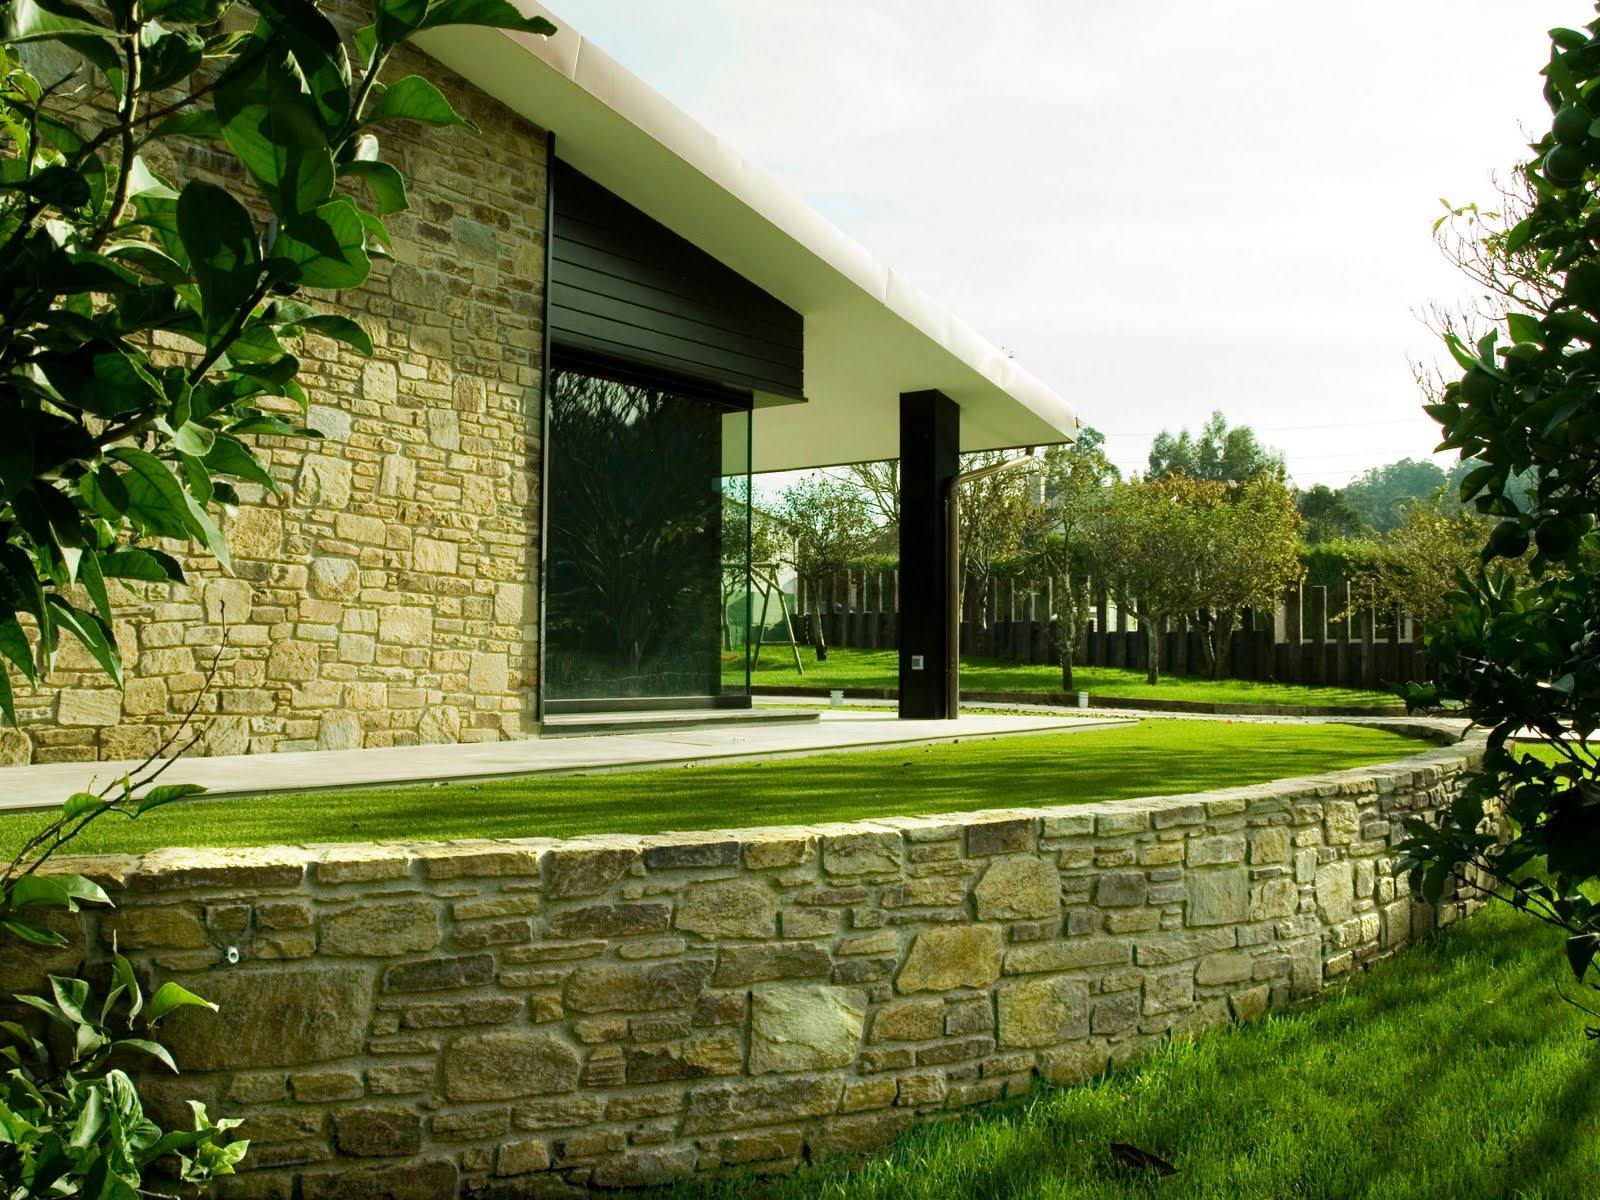 Arquitectura arquidea arquitectura de dise o - Arquitectura de diseno ...